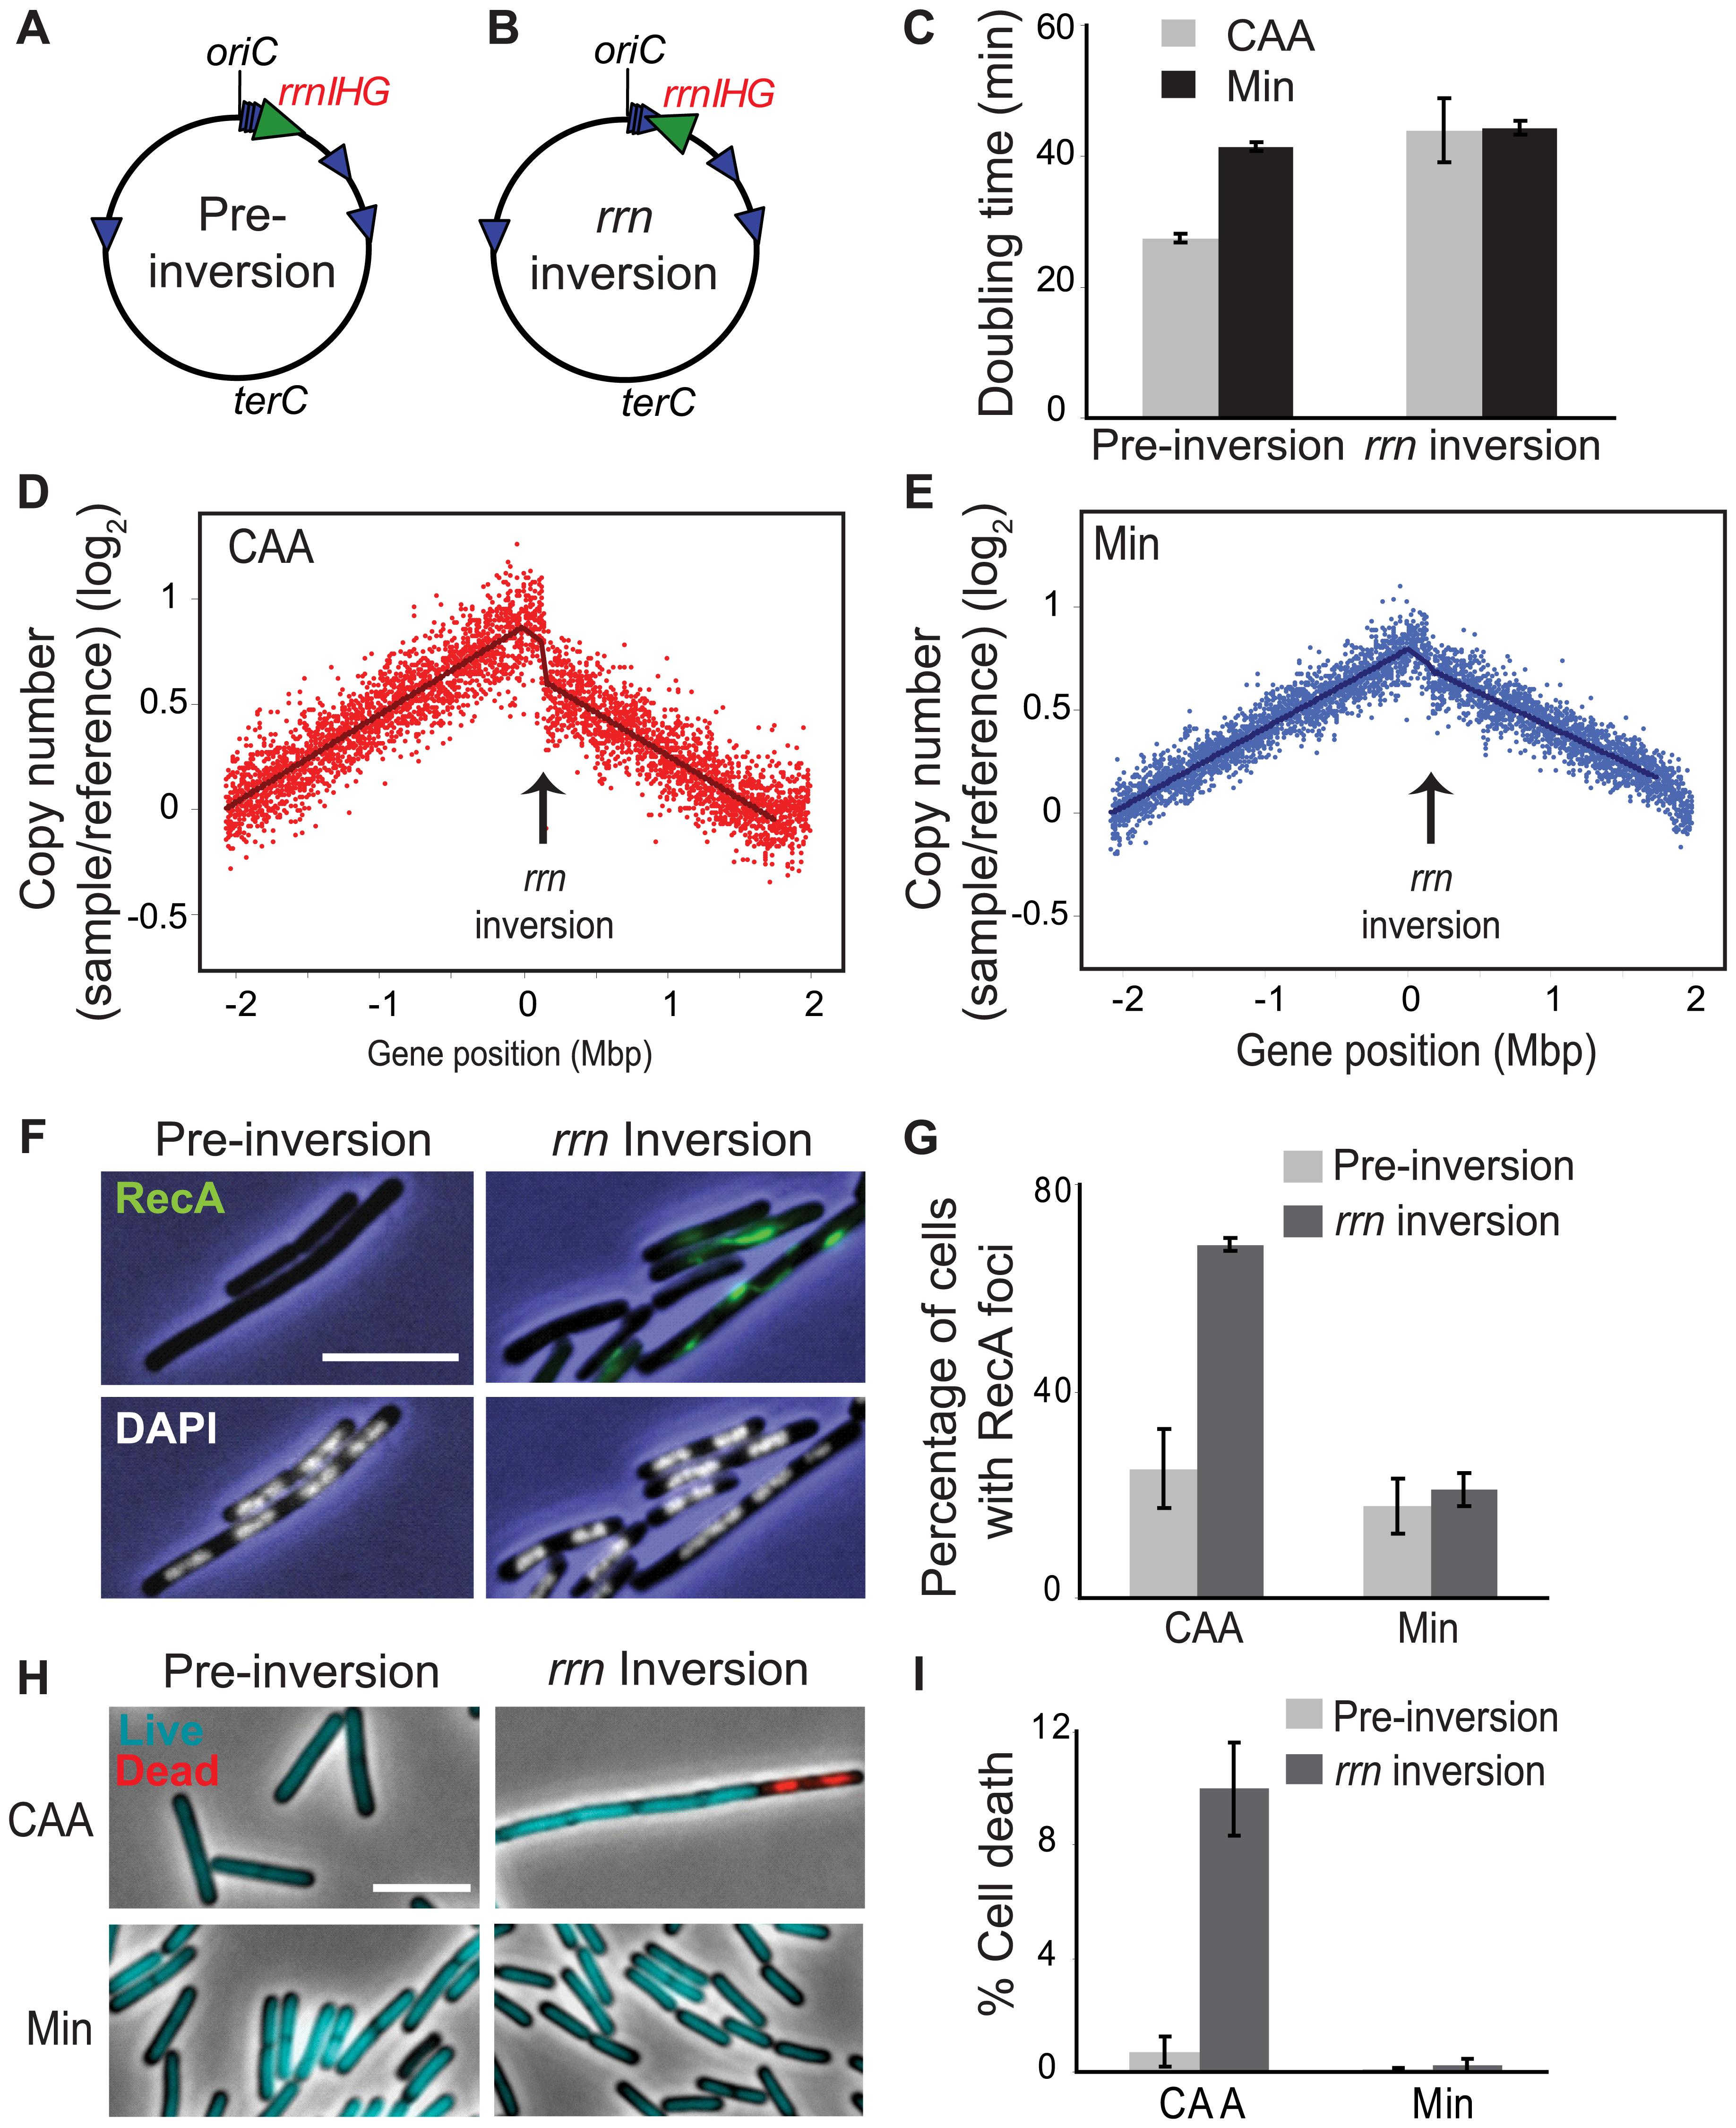 Inversion of <i>rrnIHG</i> impedes replication, triggers RecA recruitment, and elevates cell death.